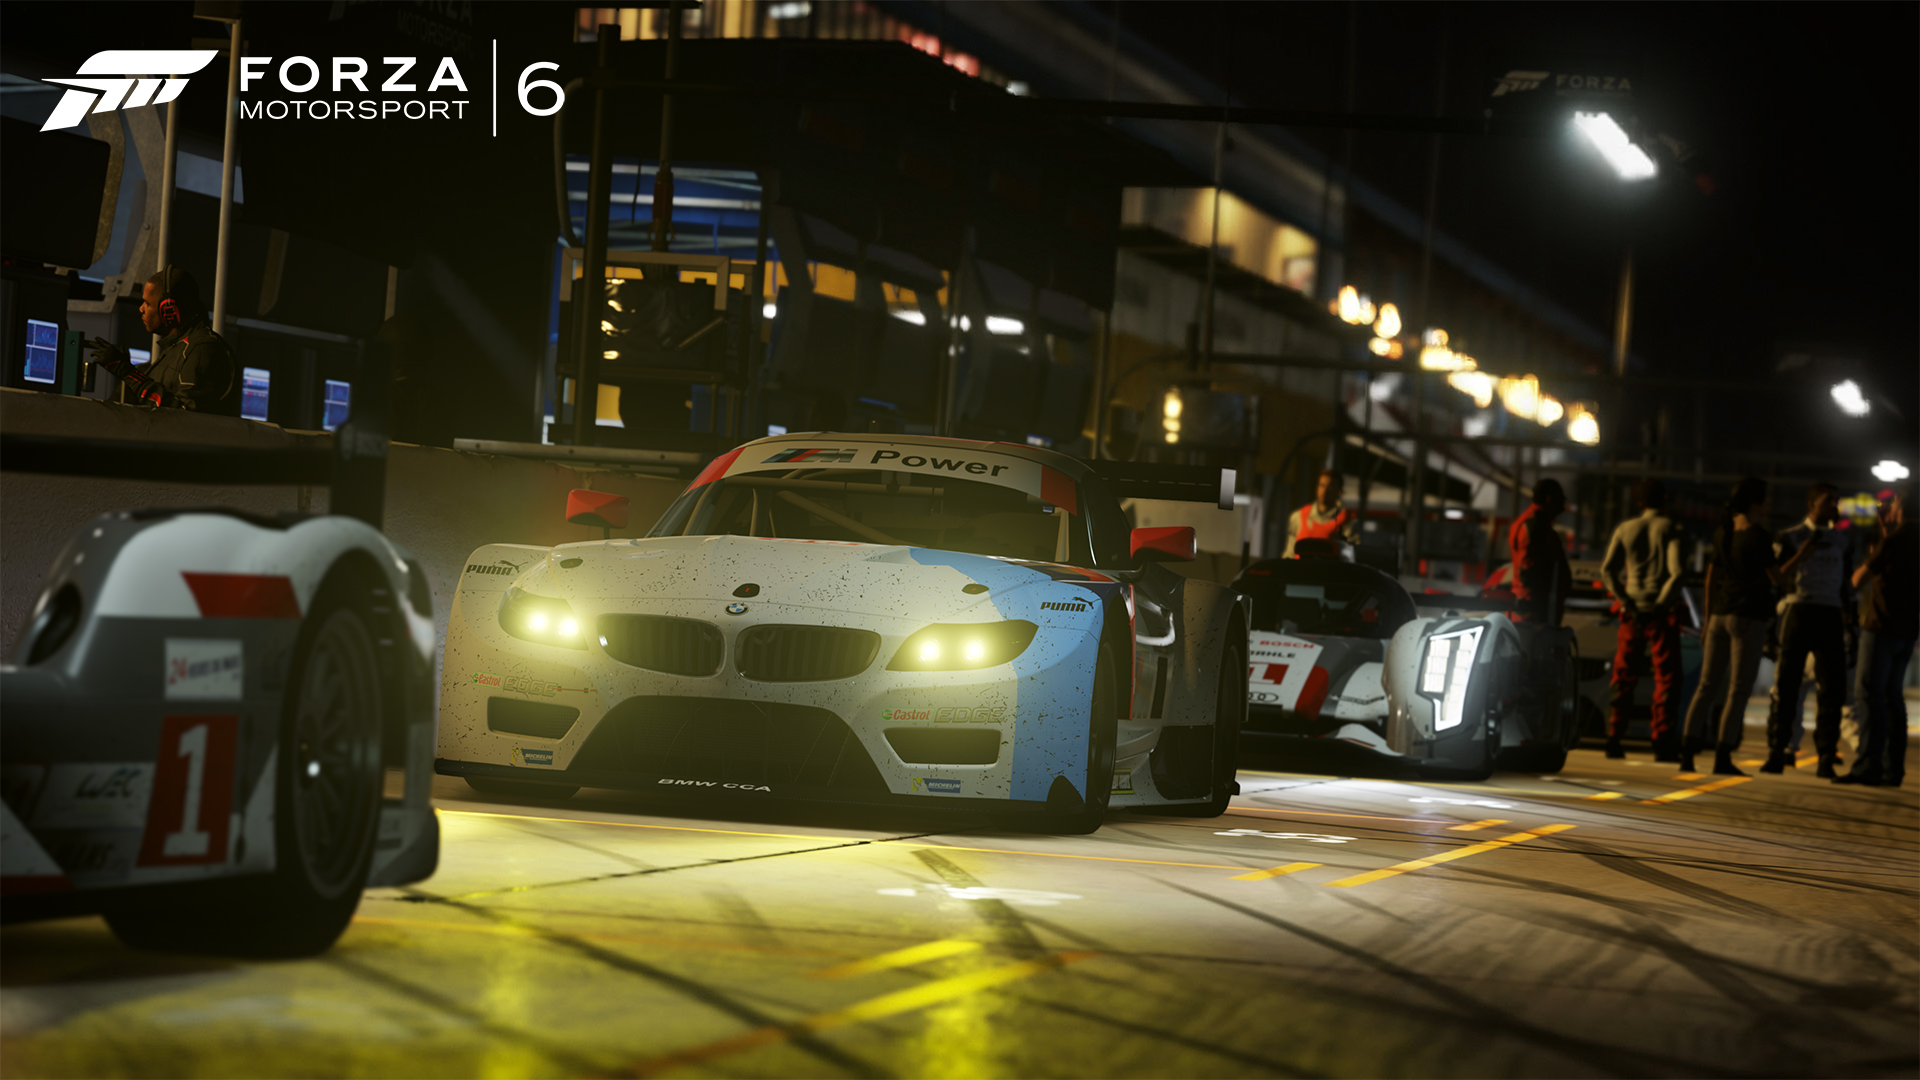 Forza Motorsport 6 - night